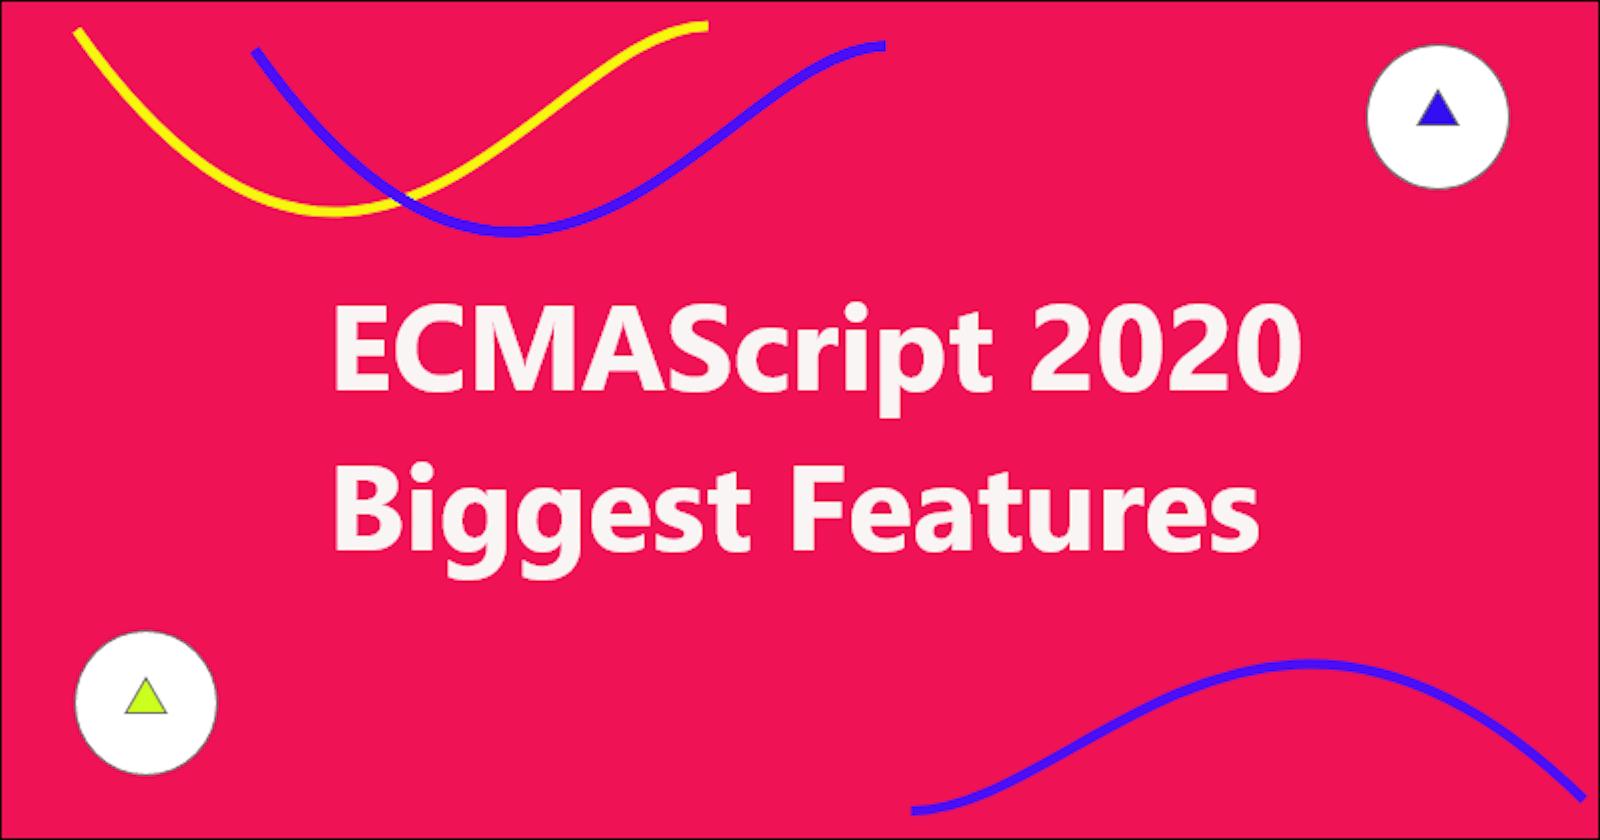 What's new in ECMAScript 2020 (ES2020) - Biggest new features